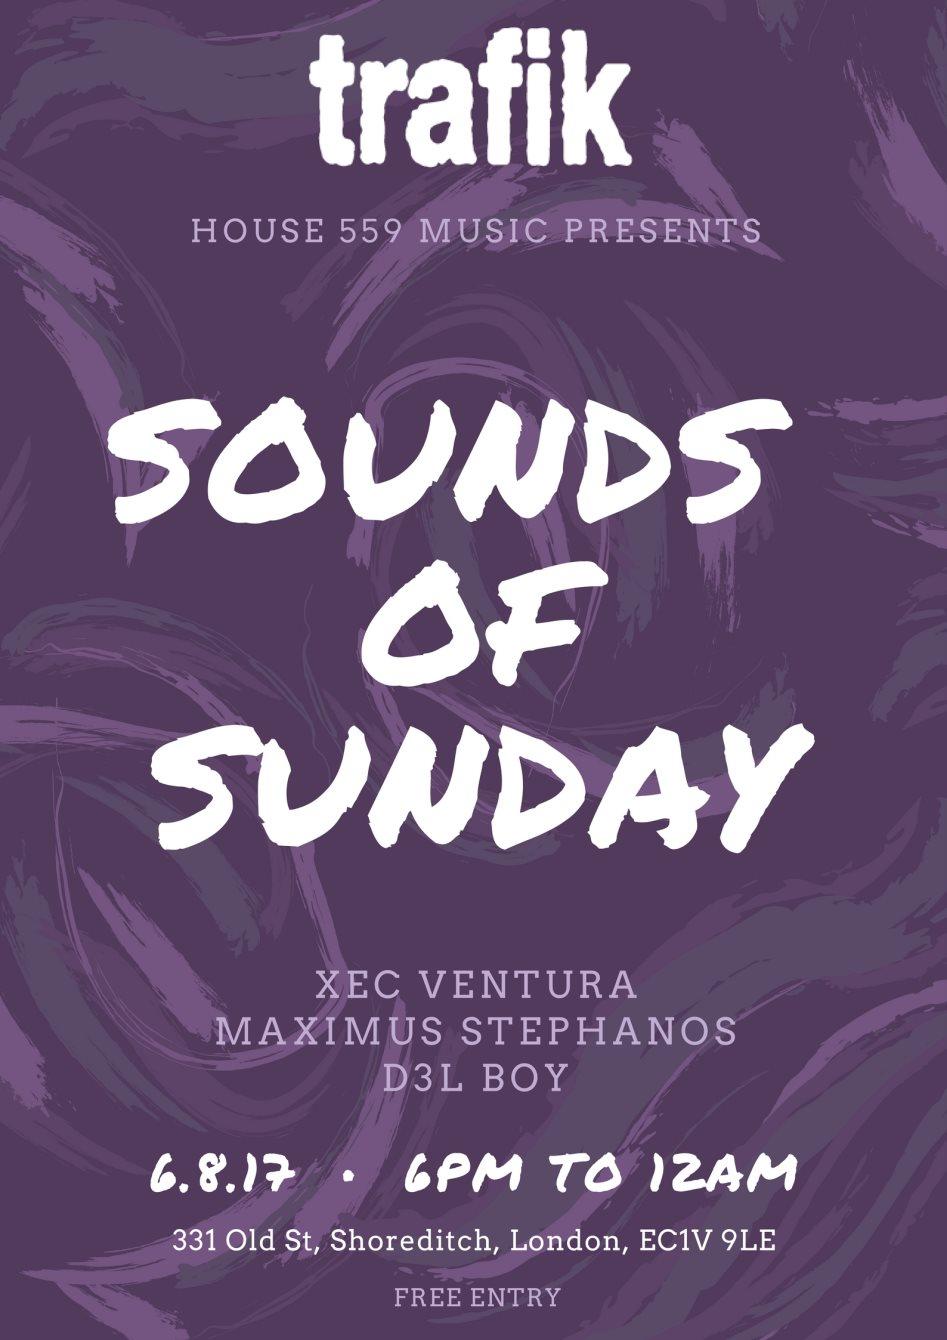 RA: House 559 Music presents: Sounds Of Sunday at Trafik, London (2017)